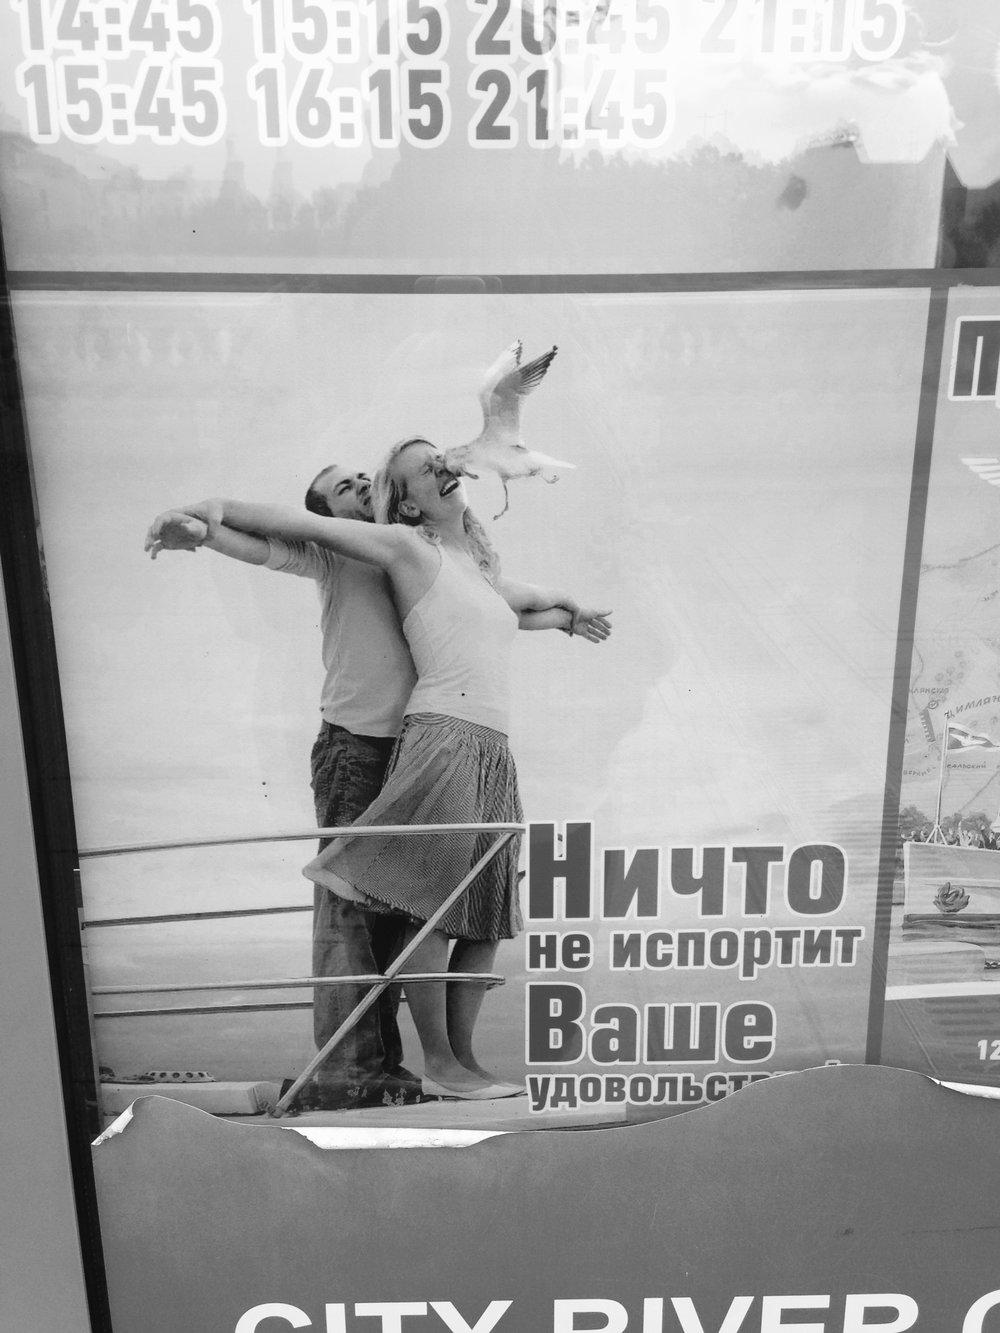 Russian (Titanic) Humor